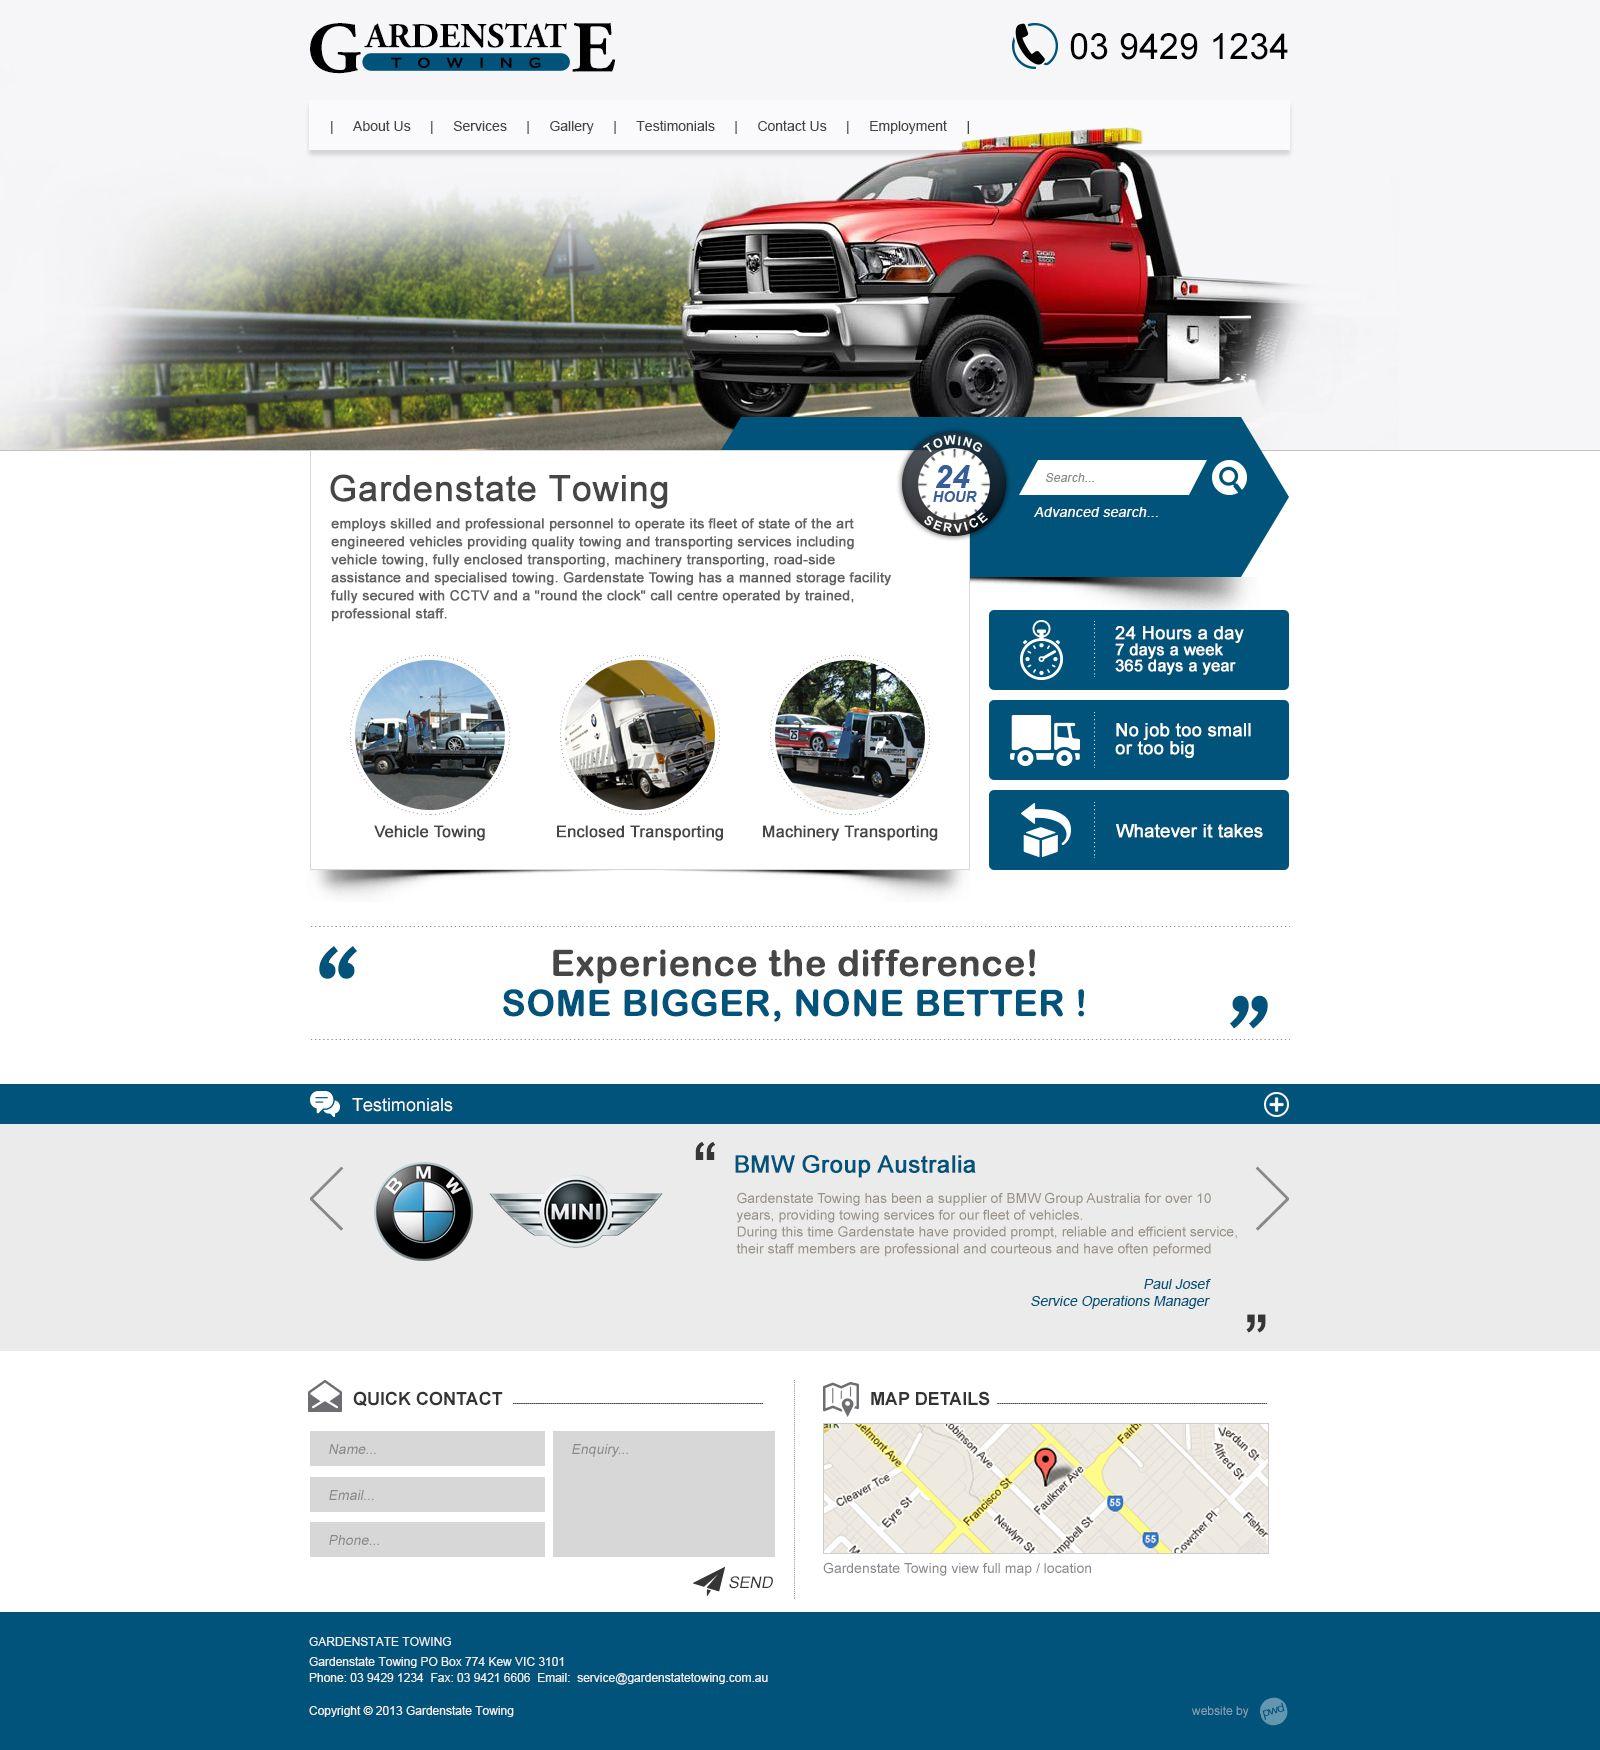 Garden Web Design Gallery Garden State Towing #website #weblayout #webdesign #inspiration .